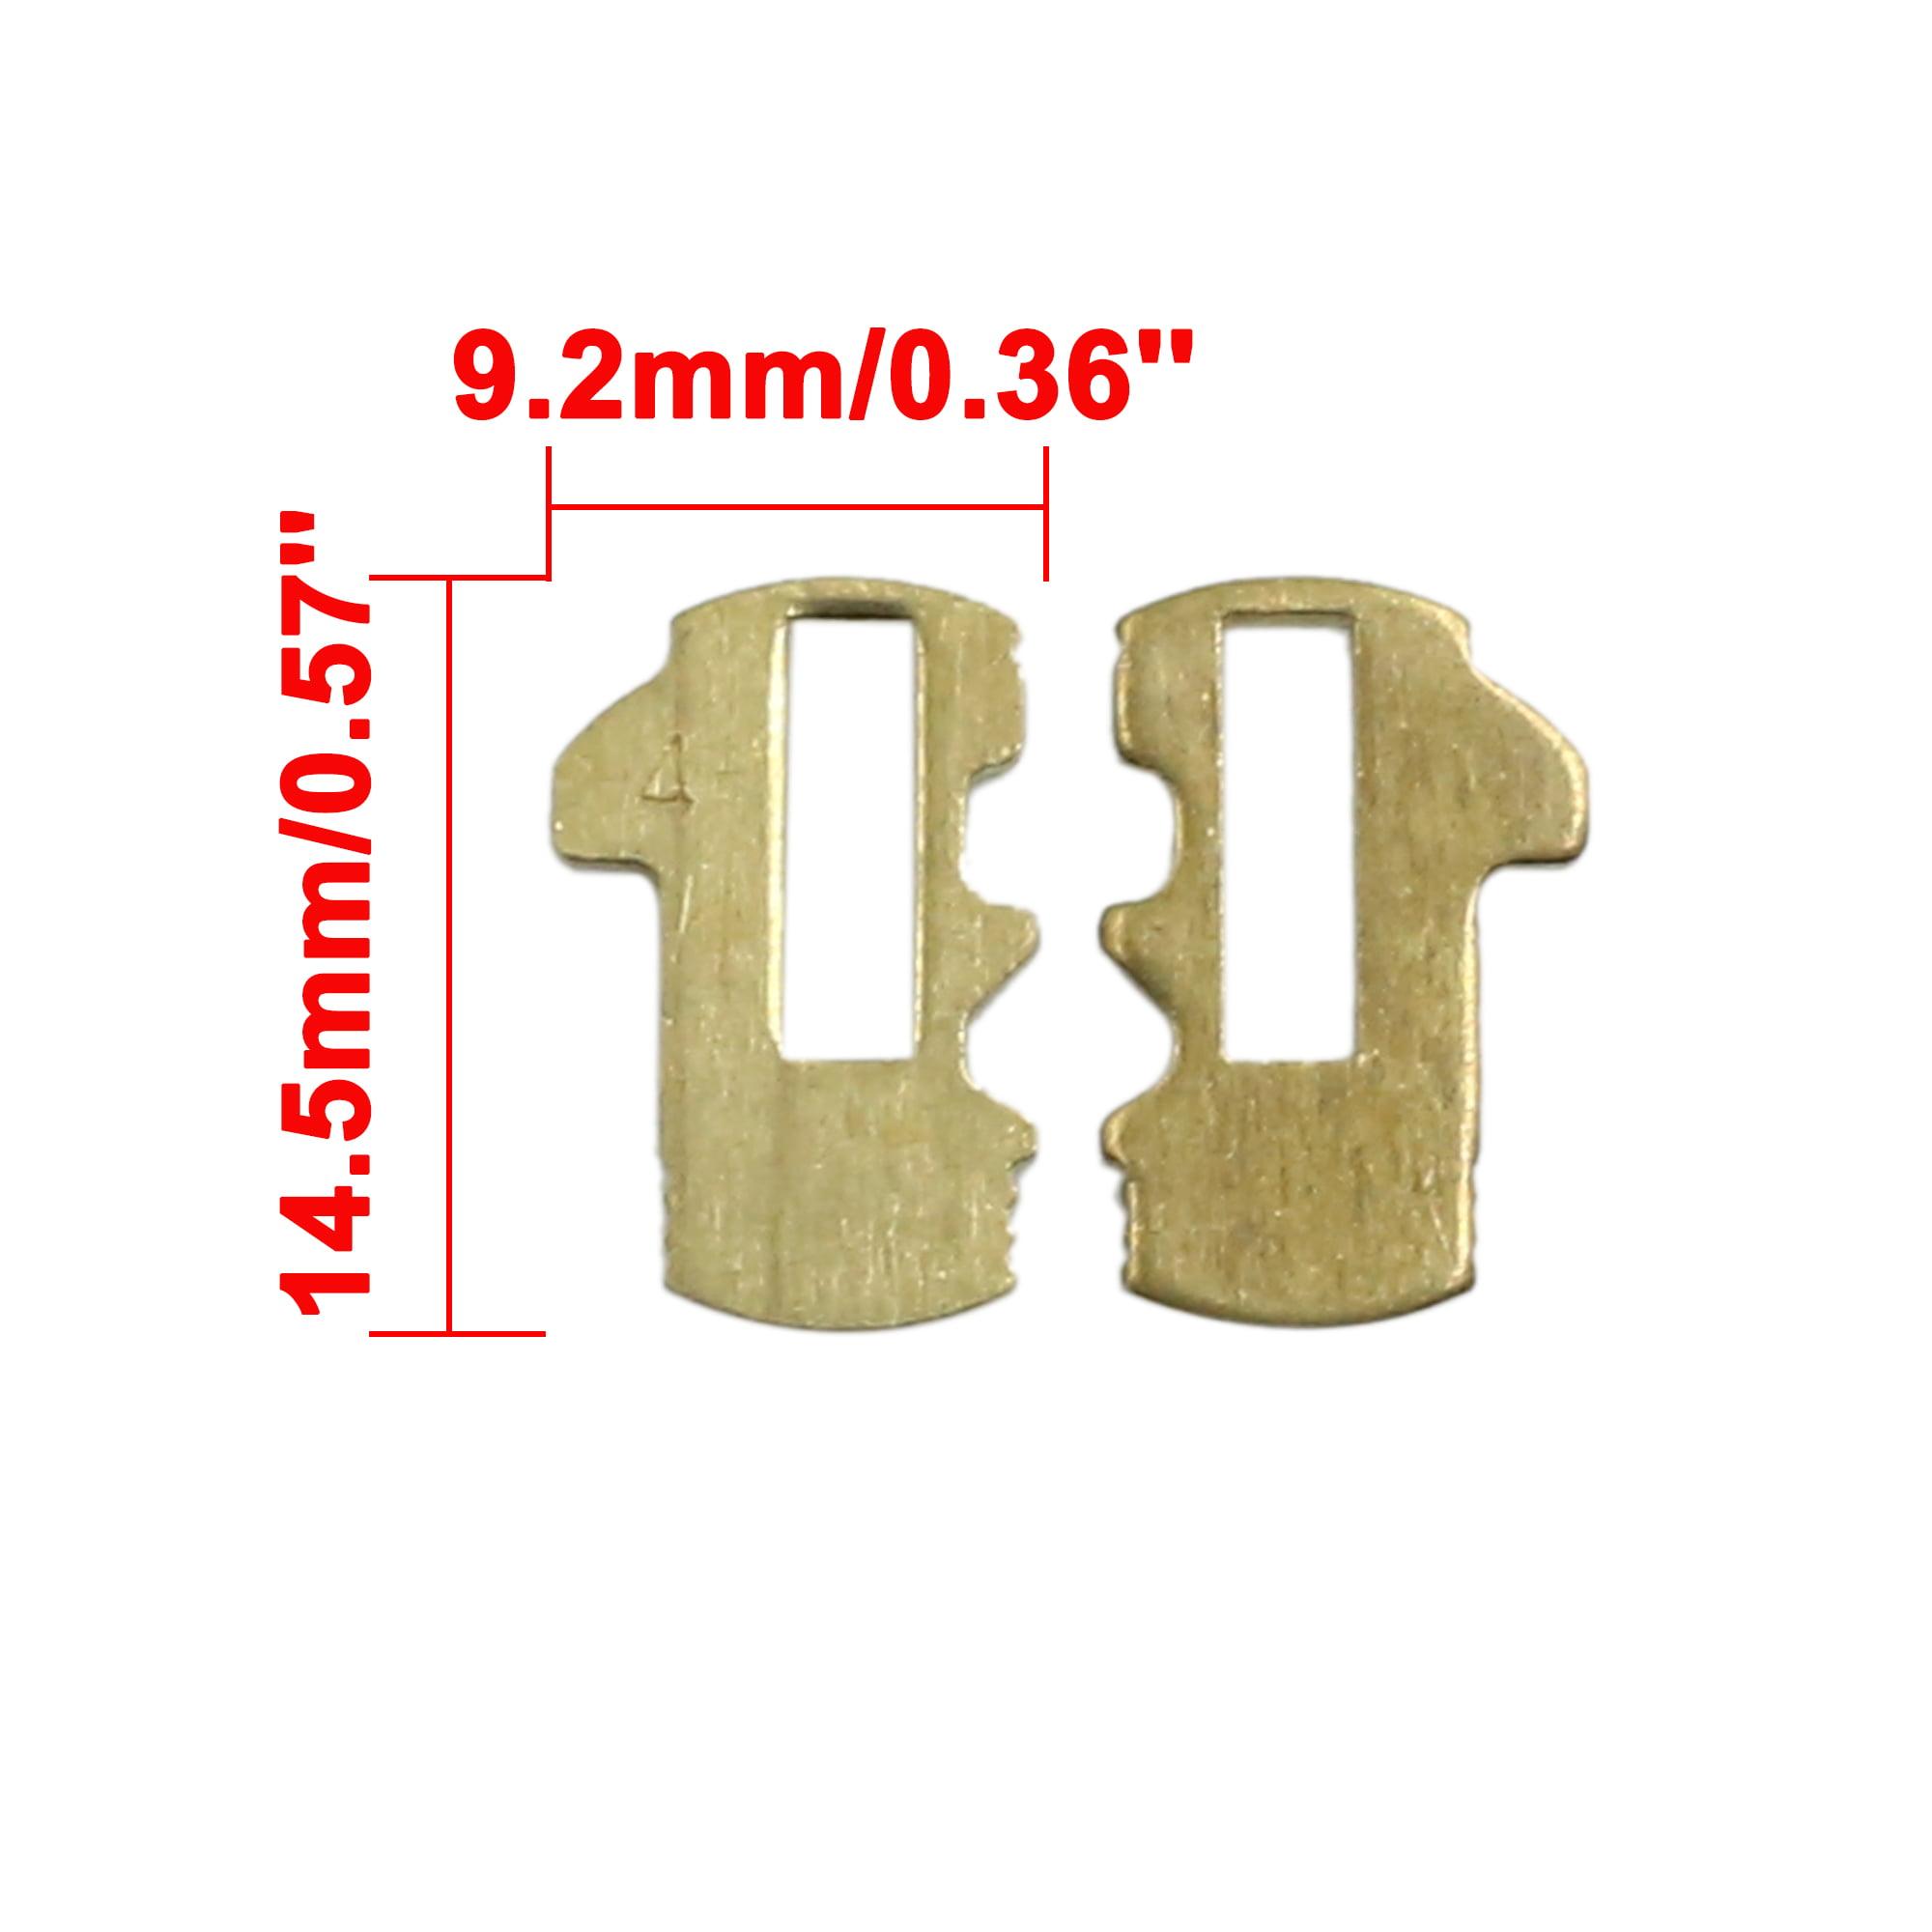 30pcs Gold Tone Metal Car Lock Reed Vehicle Locking Plate Gasket 14.5 x 9.2mm for Buick - image 1 of 2